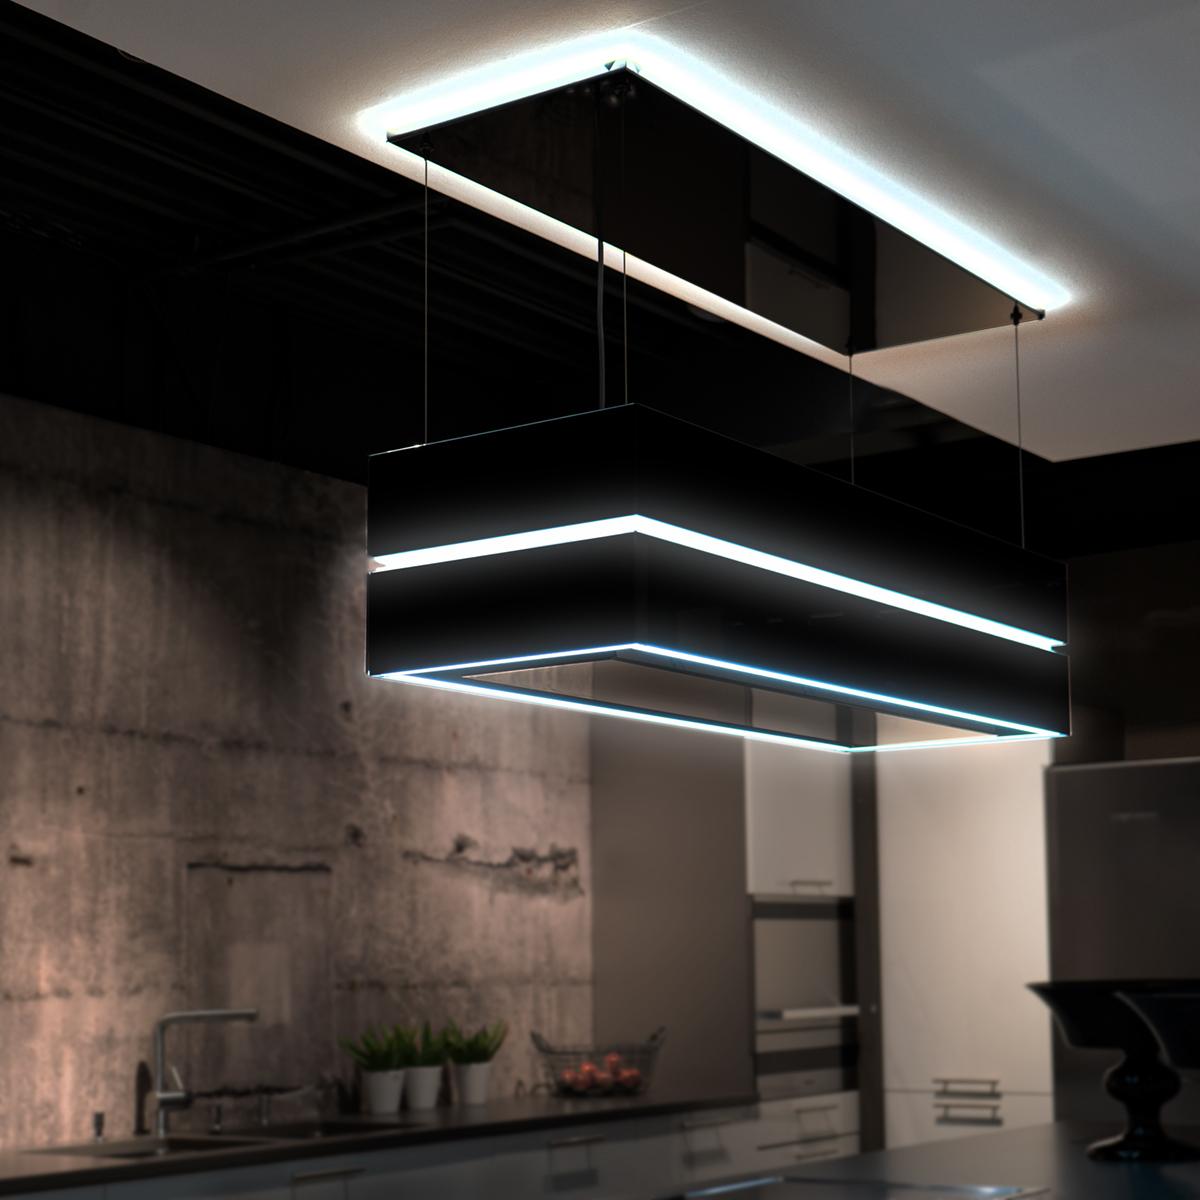 Licht-Konzepte-Kueche-Dunst-Abzugshaube_SAAR-Kuechen